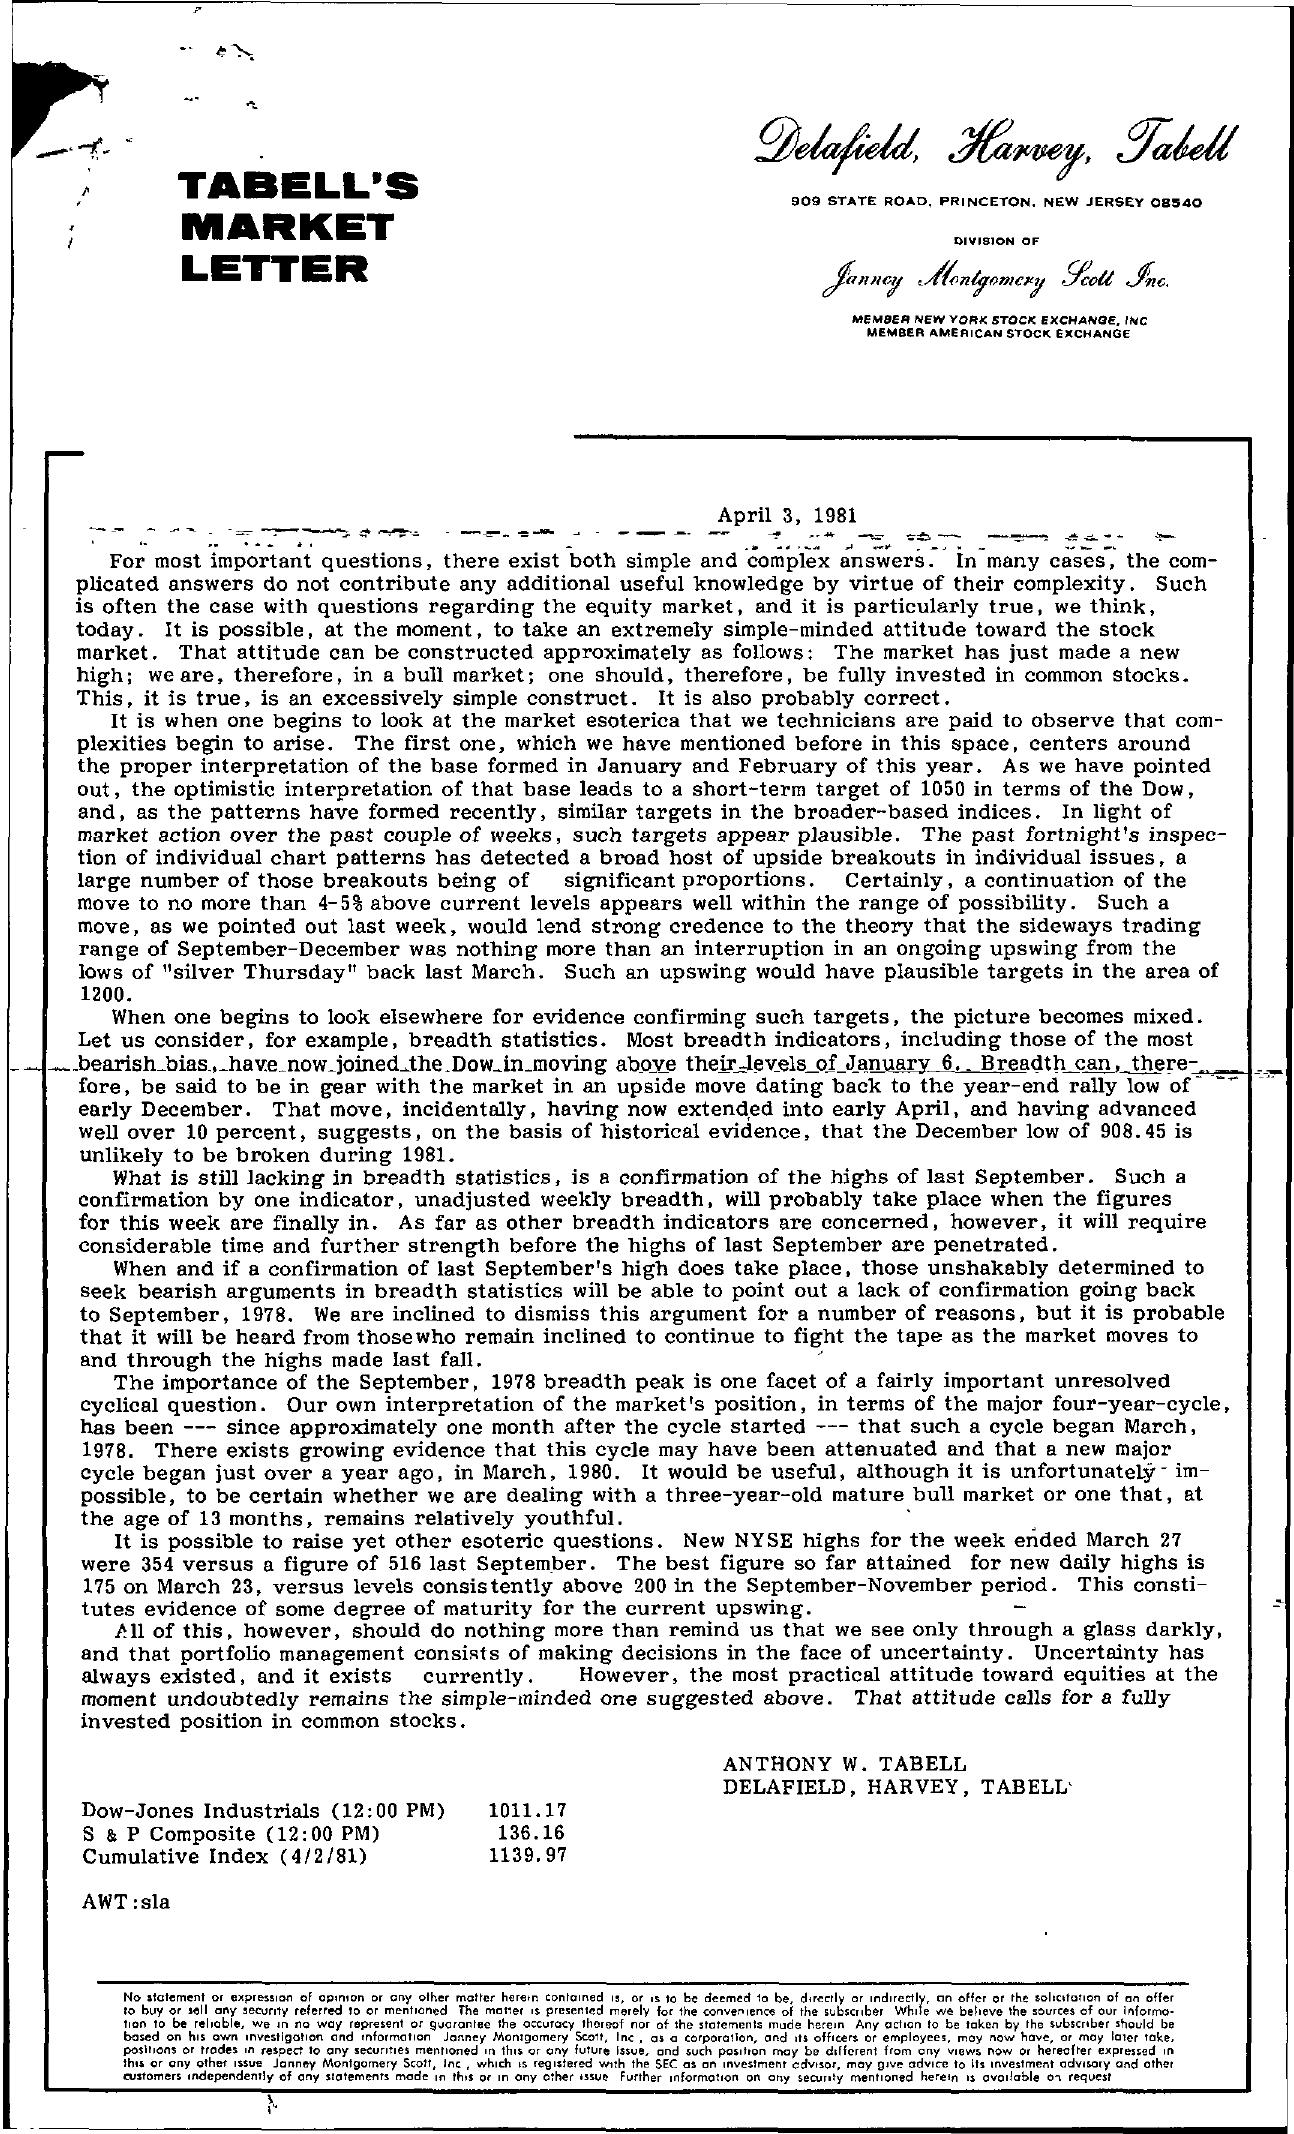 Tabell's Market Letter - April 03, 1981